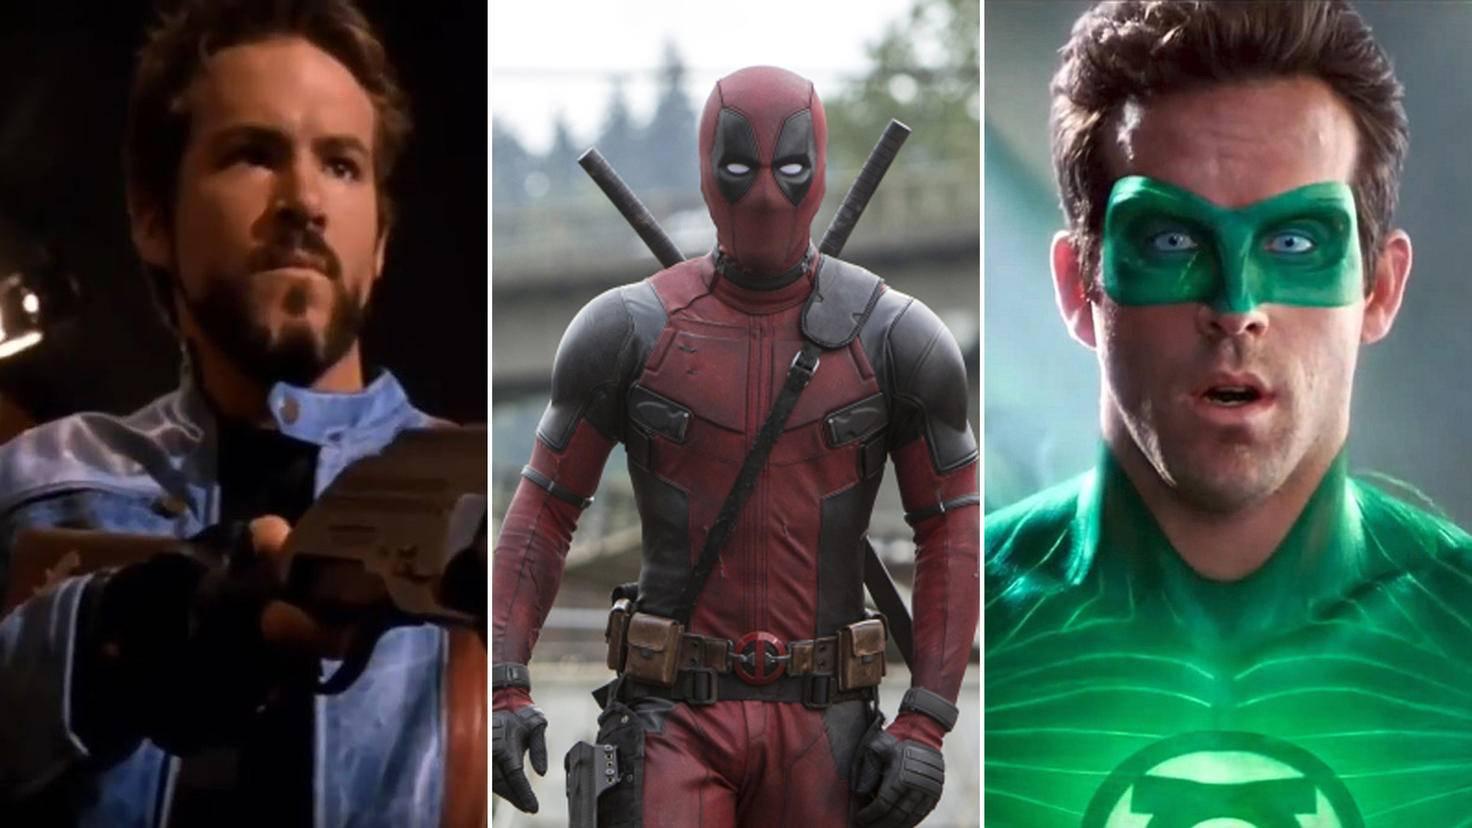 Ryan Reynolds Blade vs Deadpool vs Green Lantern